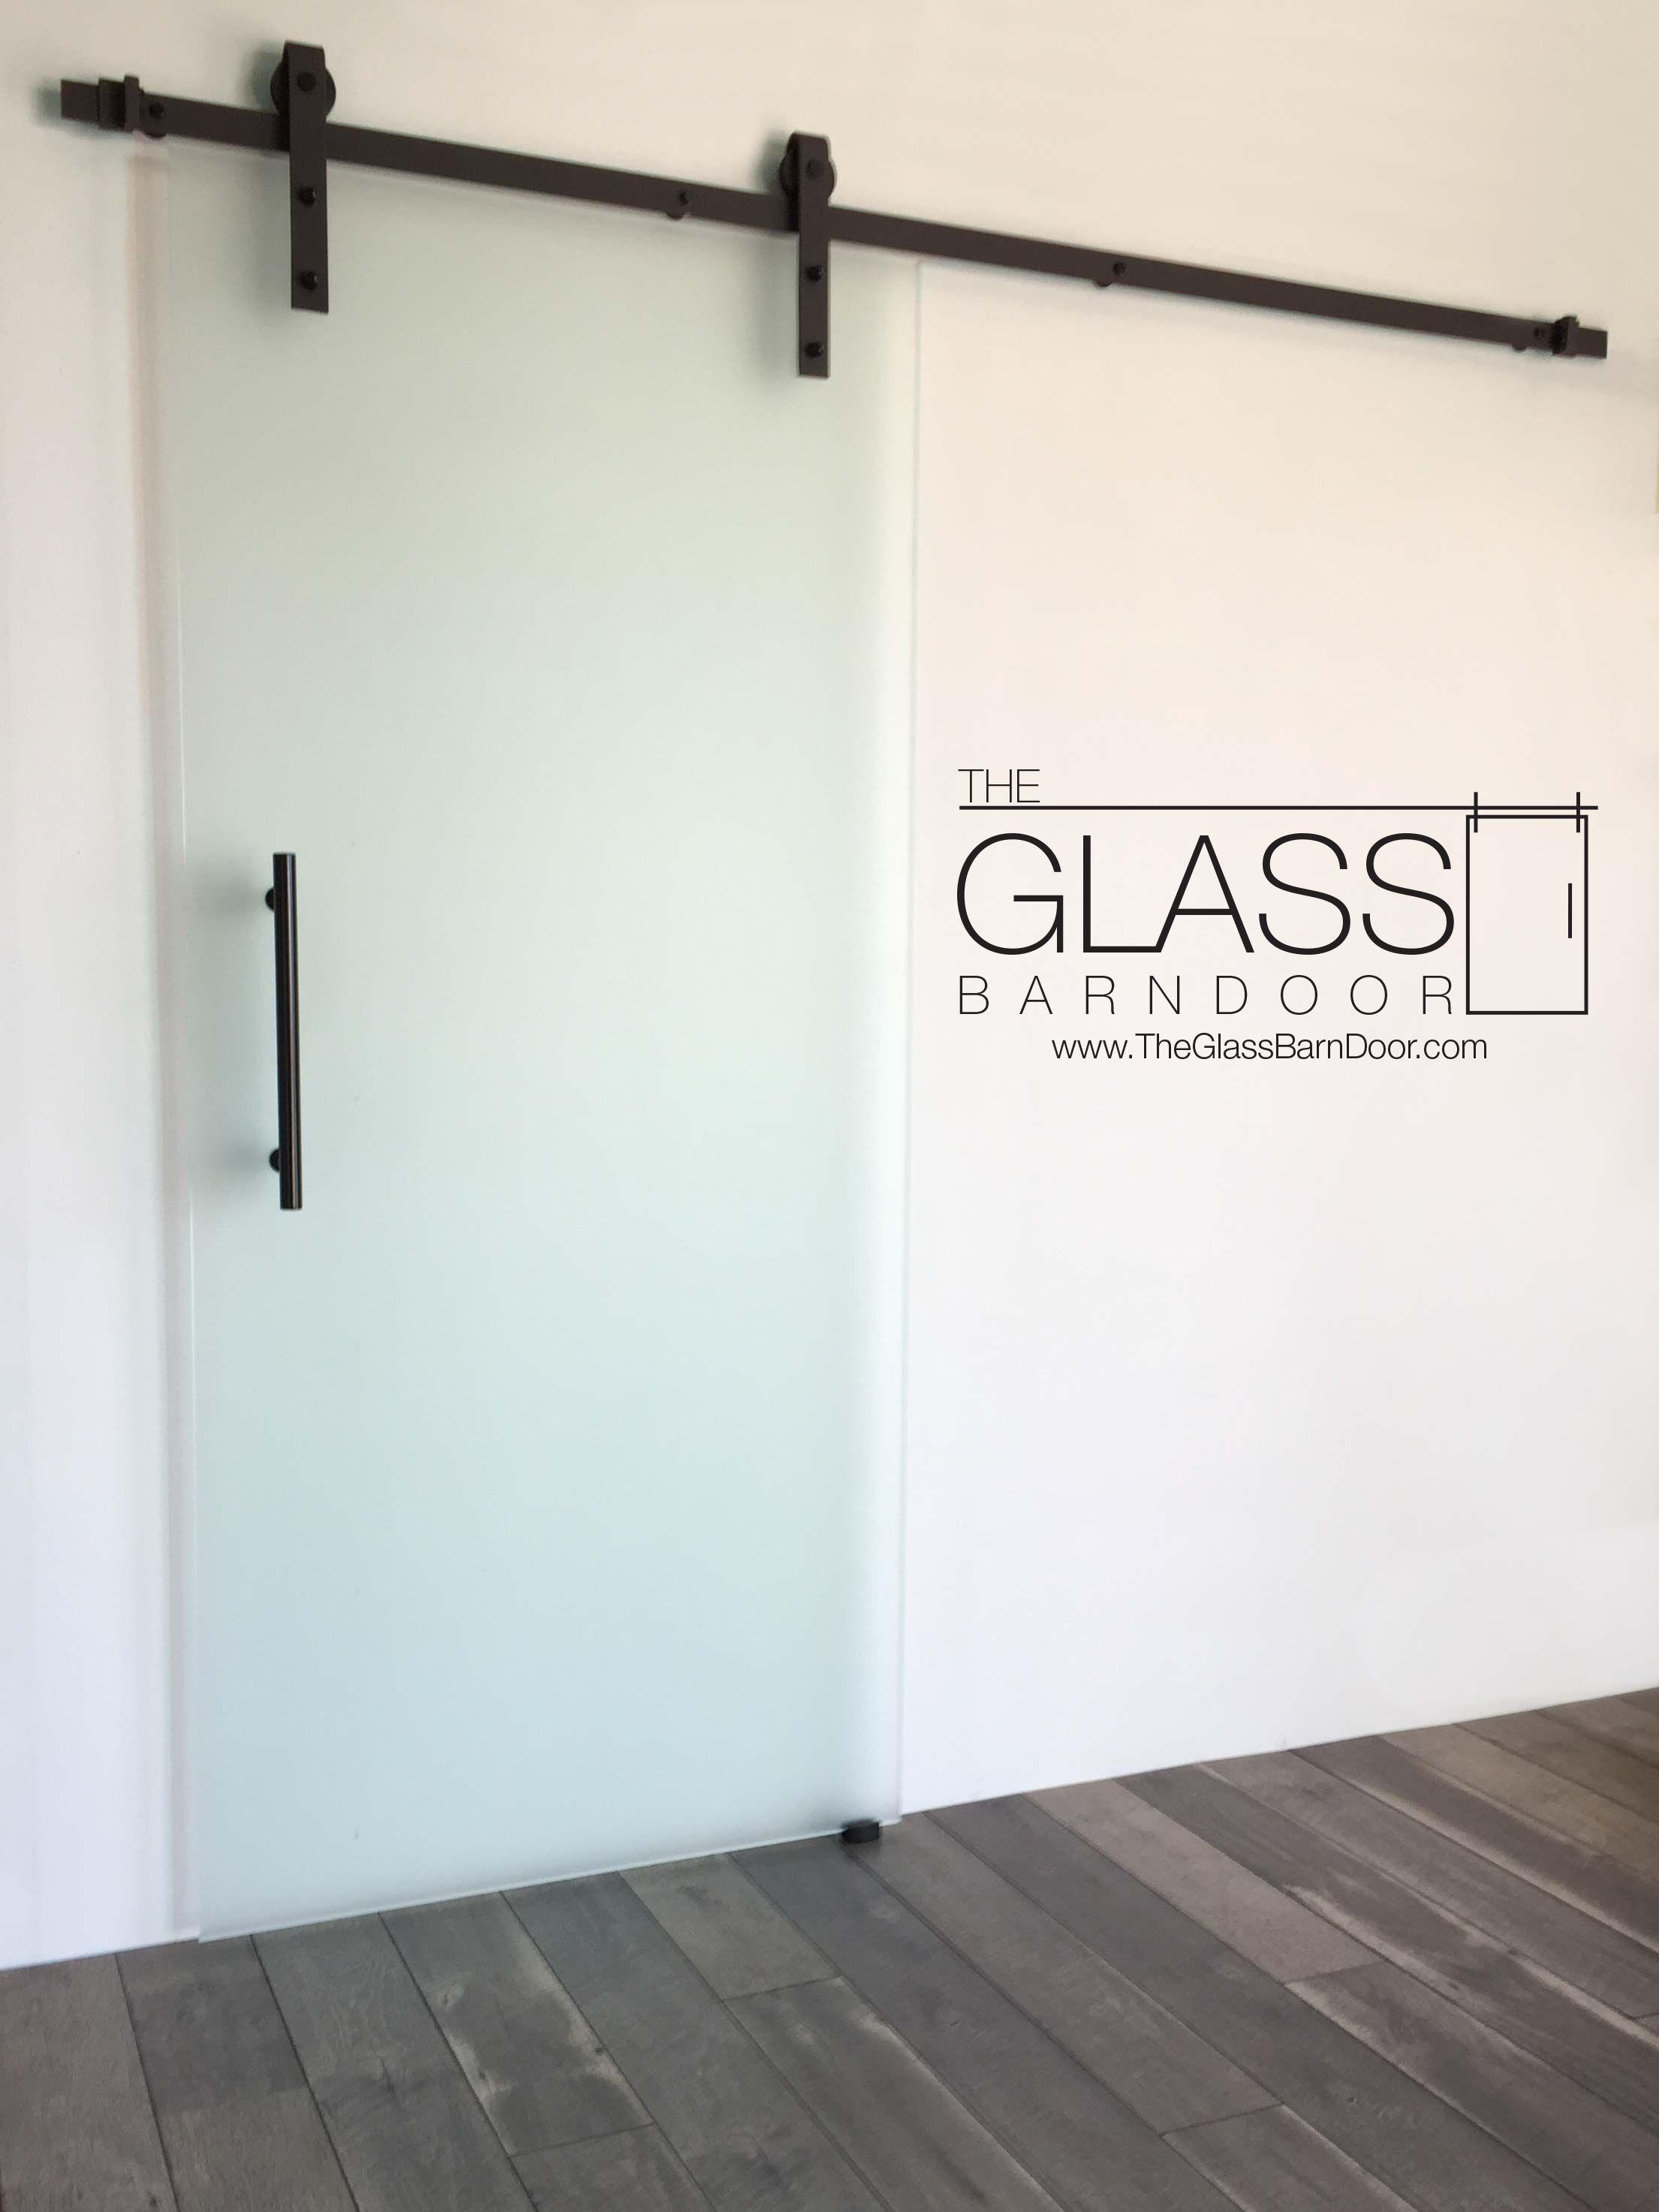 Black Industrial Frameless Single Glass Barn Doors Frosted